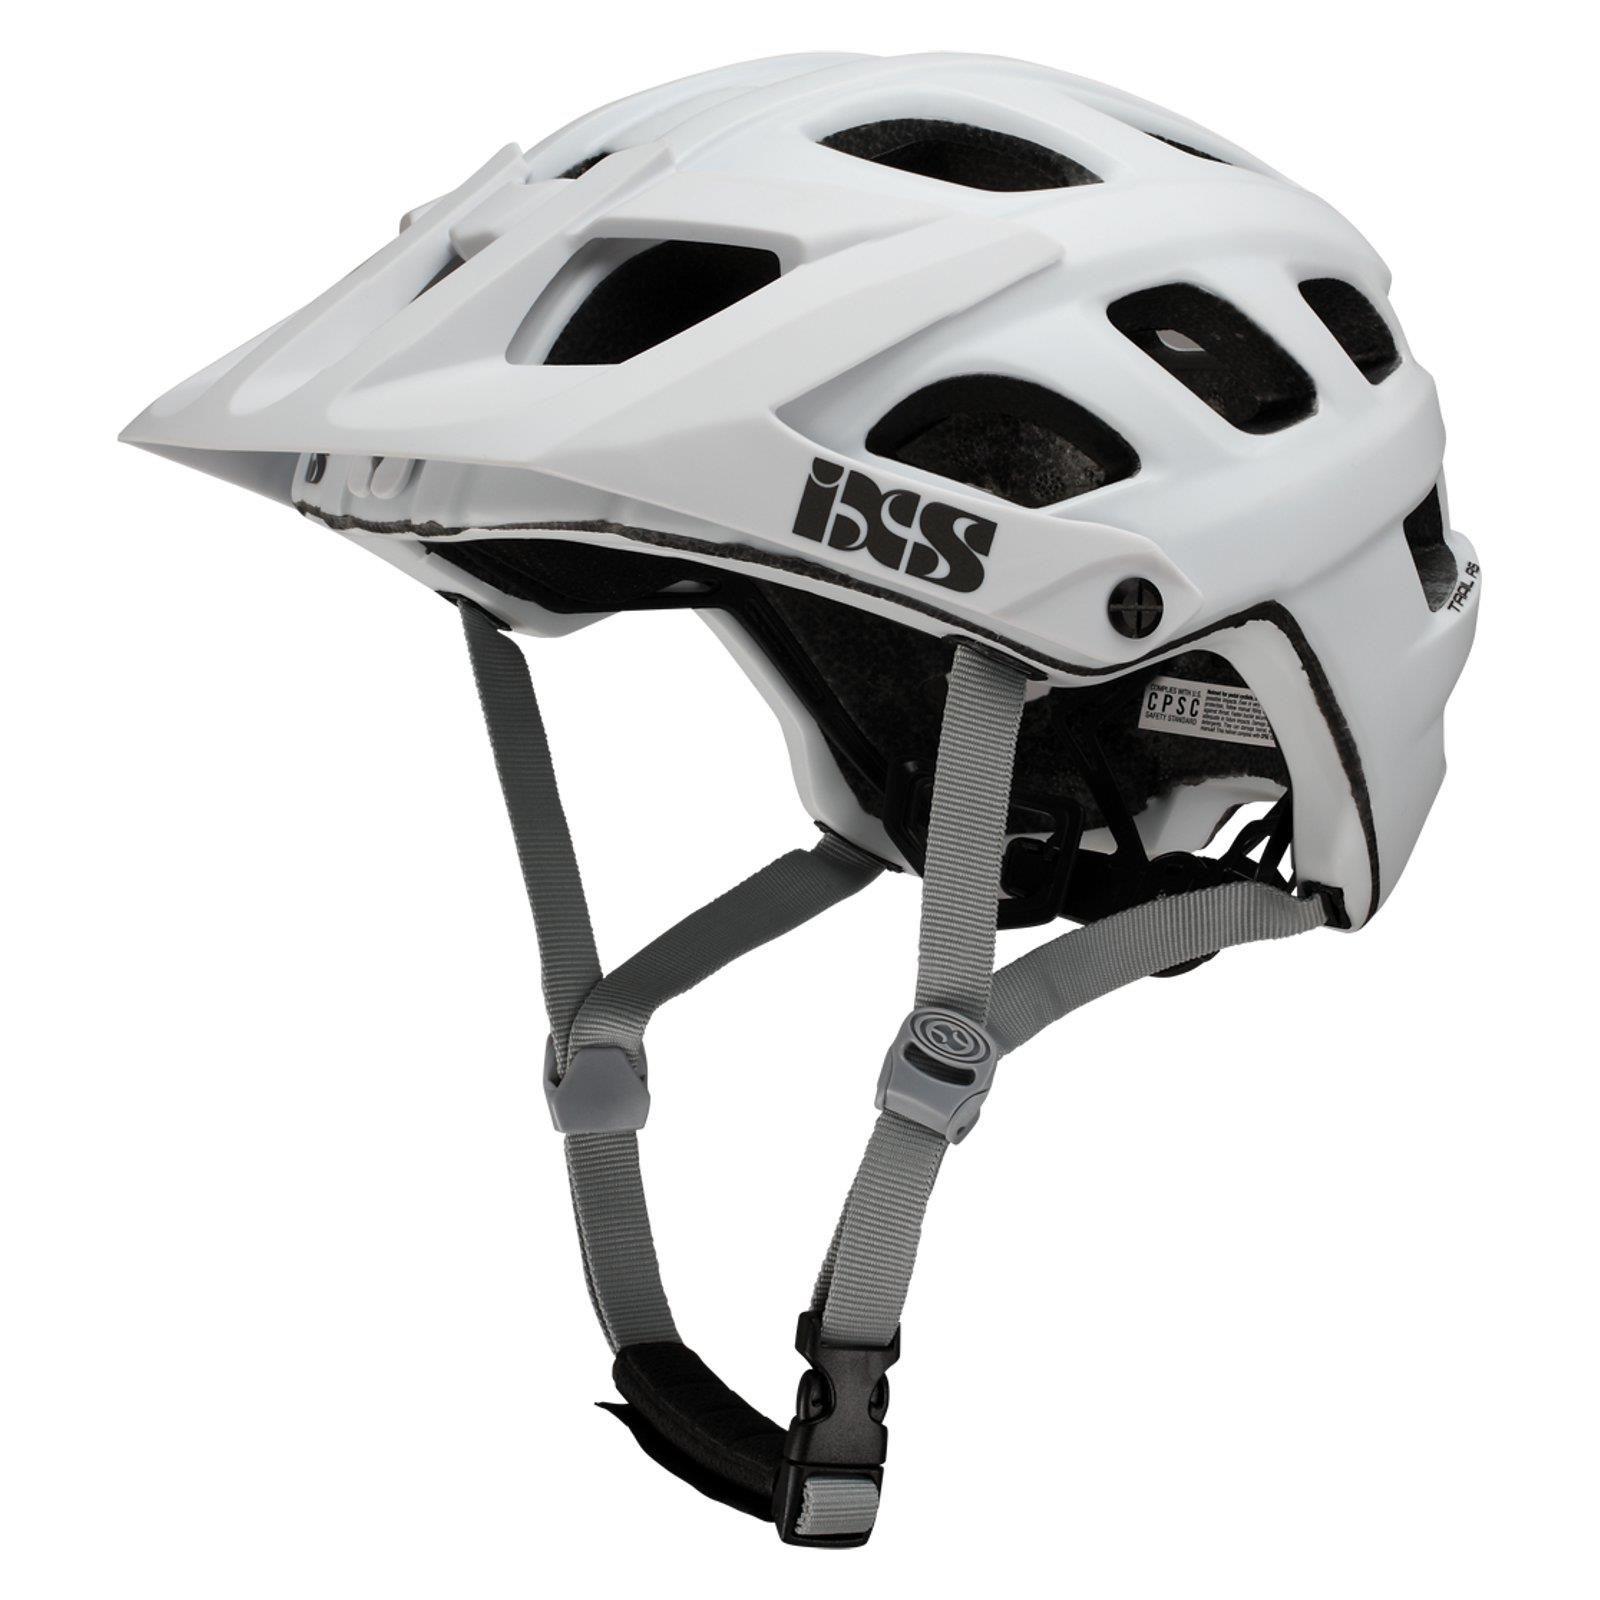 Ixs Trail Rs Evo Fahrrad Helm All Mountain Bike Am Mtb Enduro Dh Downhill Inmold All Mountain Bike Helmet Mtb